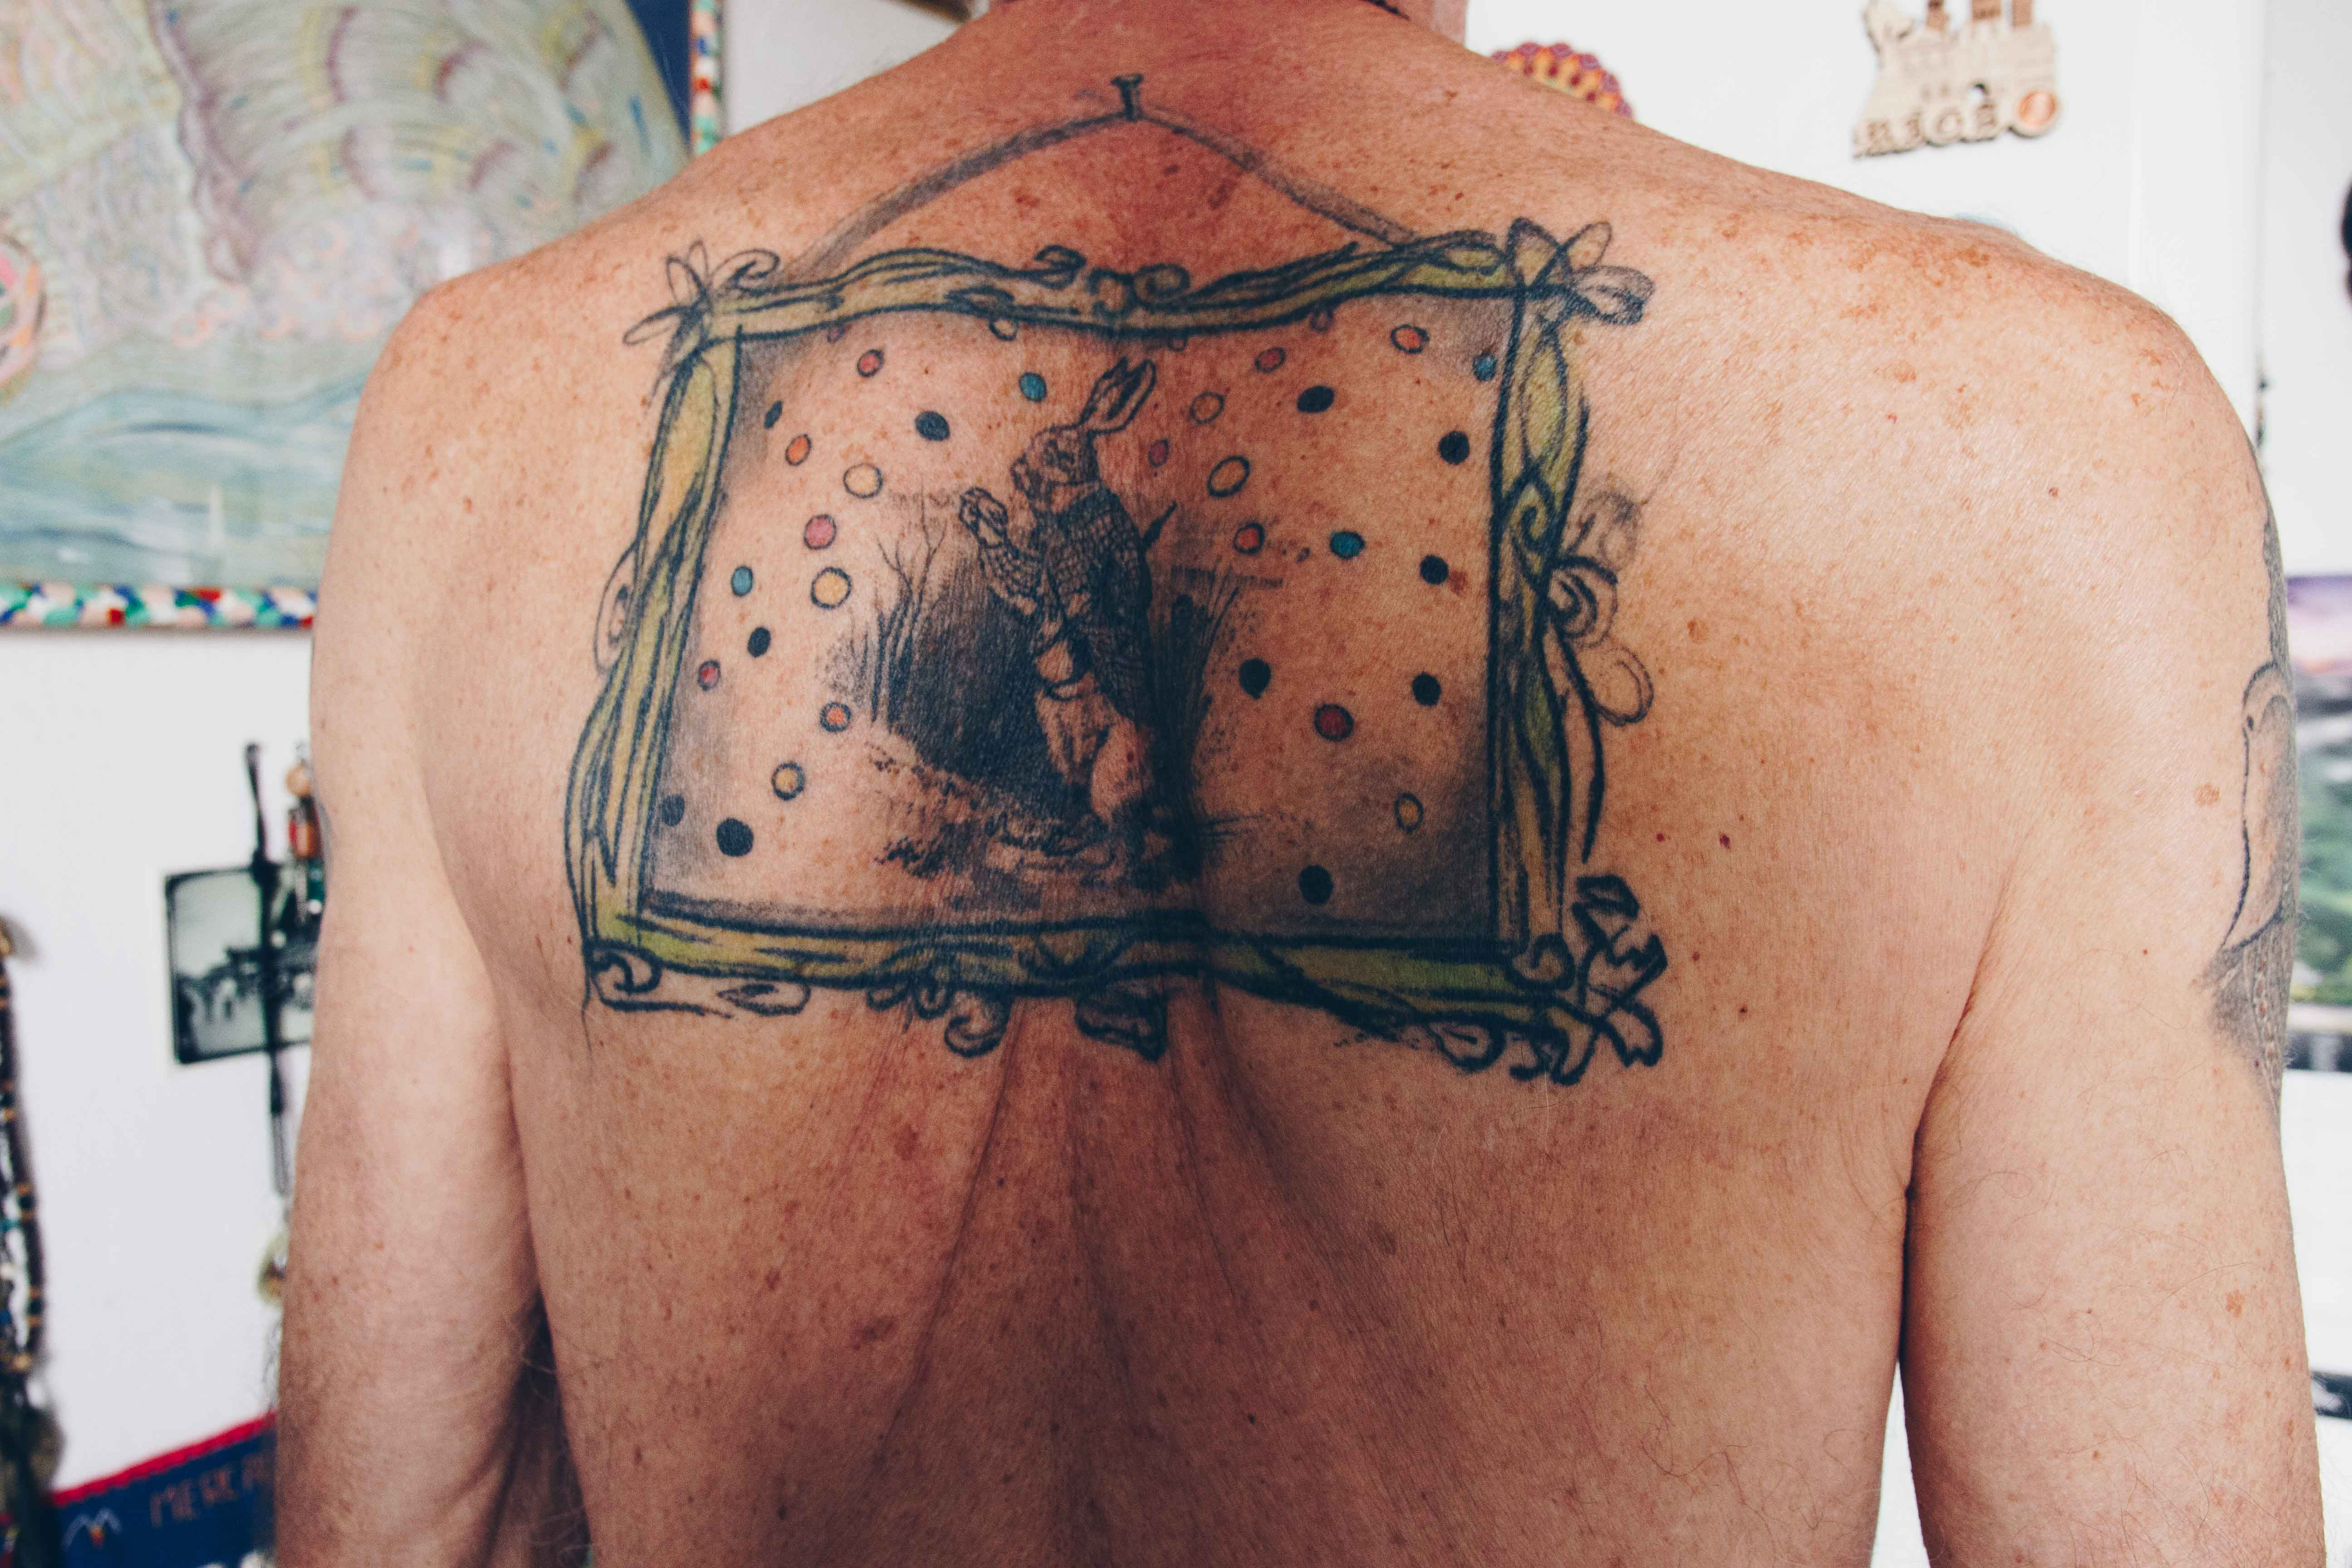 Dating uw tattoo artist